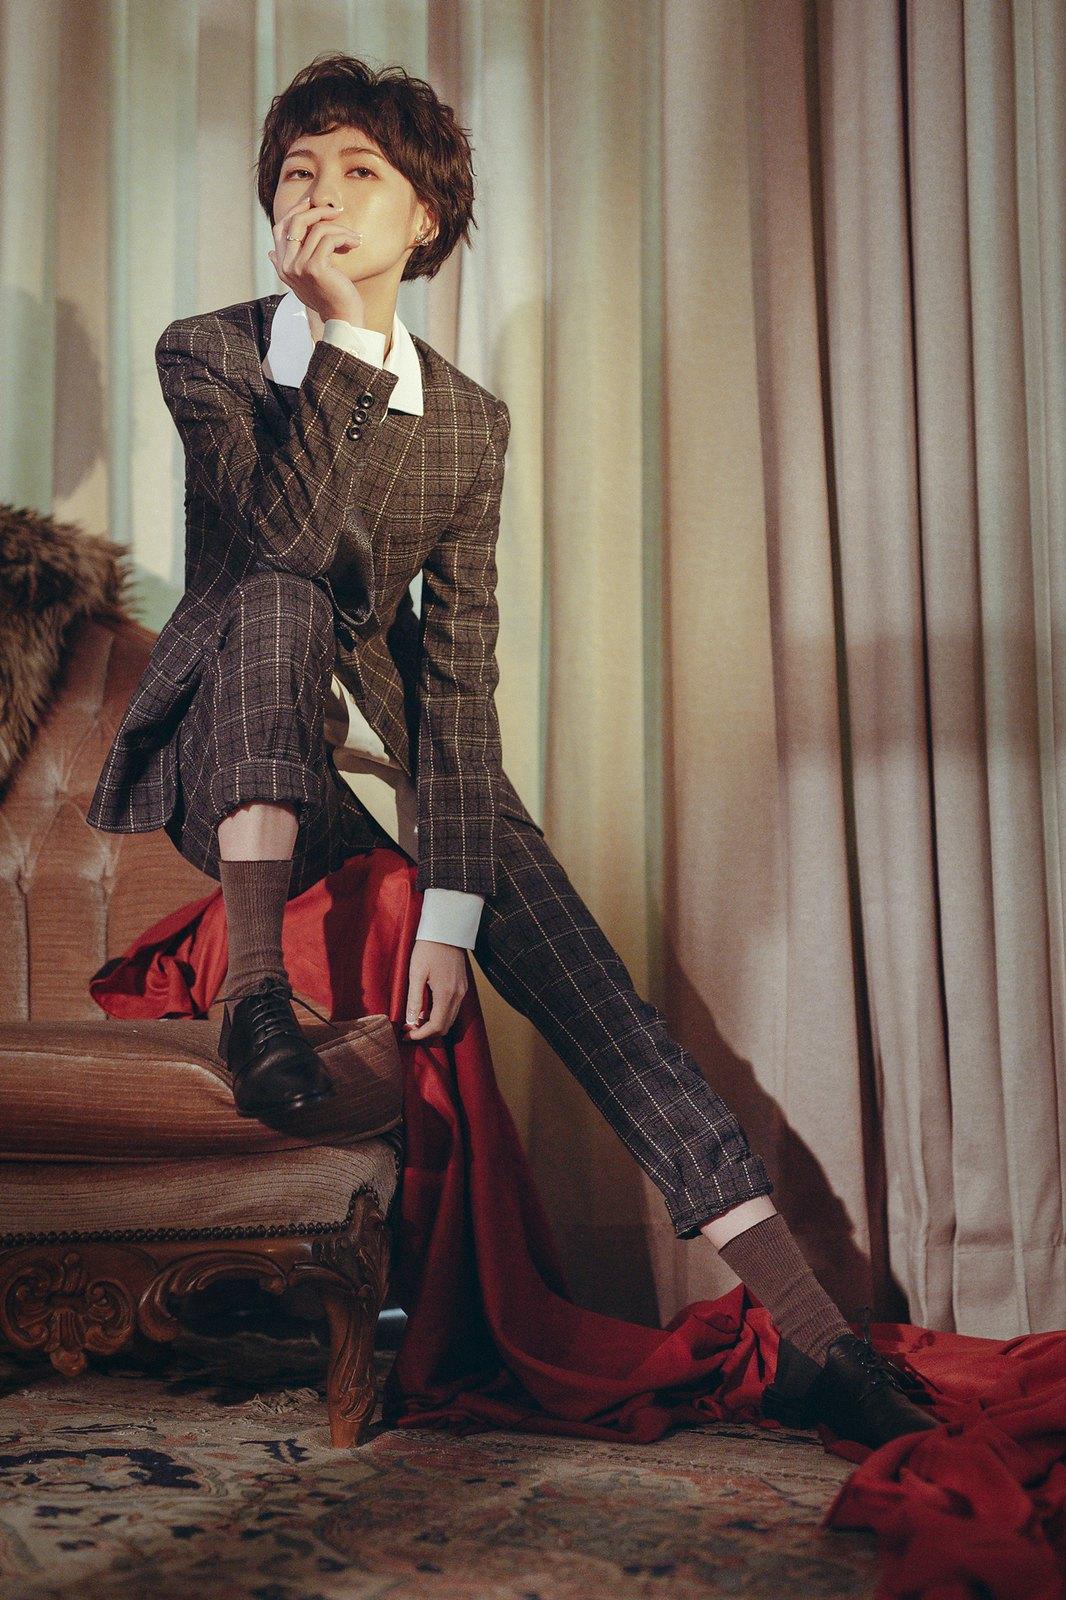 【人像攝影】Sherry x Gillian Wang / EASTERN WEDDING